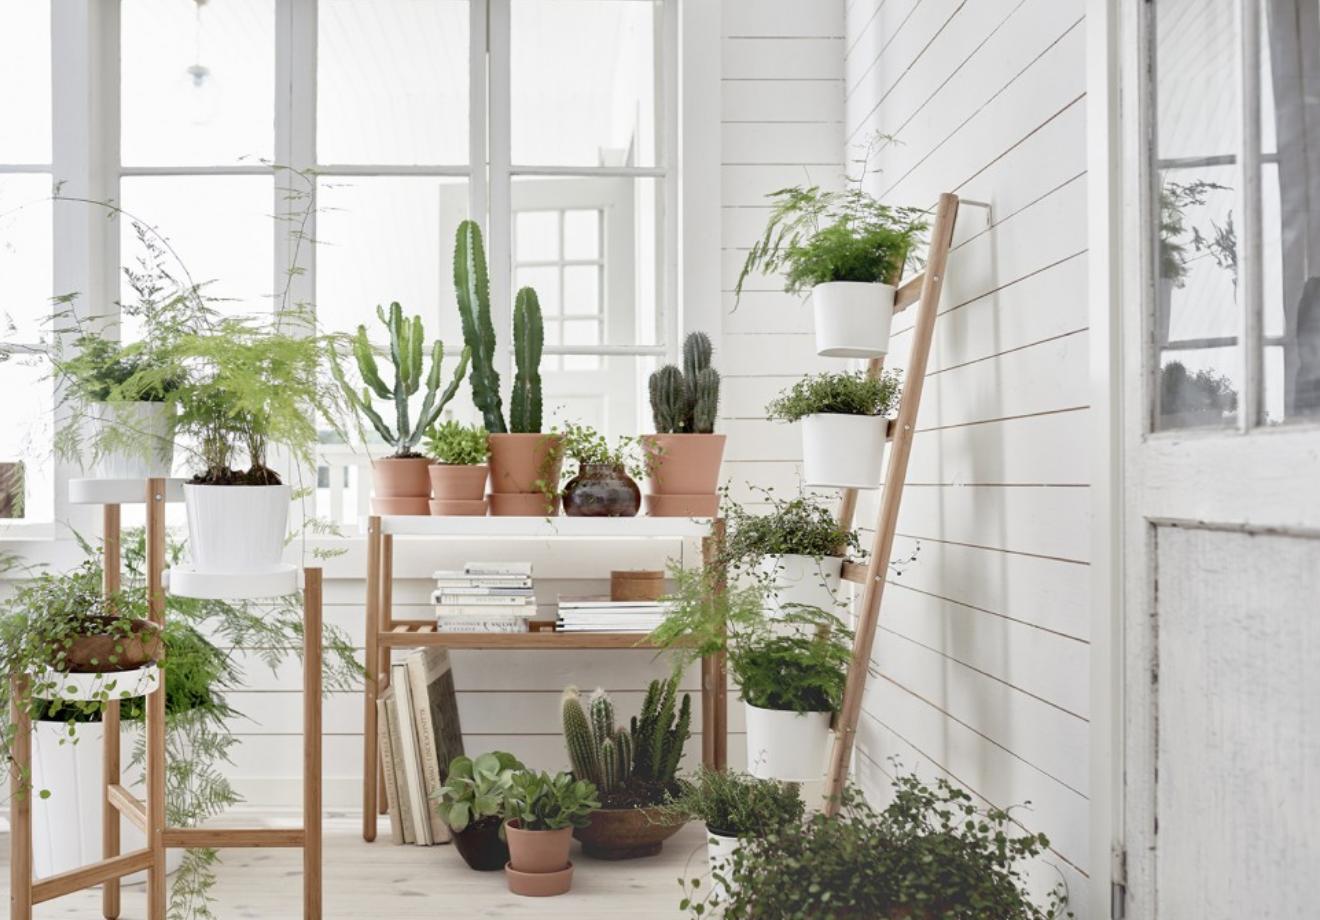 Ikea archieven • stijlvol styling   woonblog •